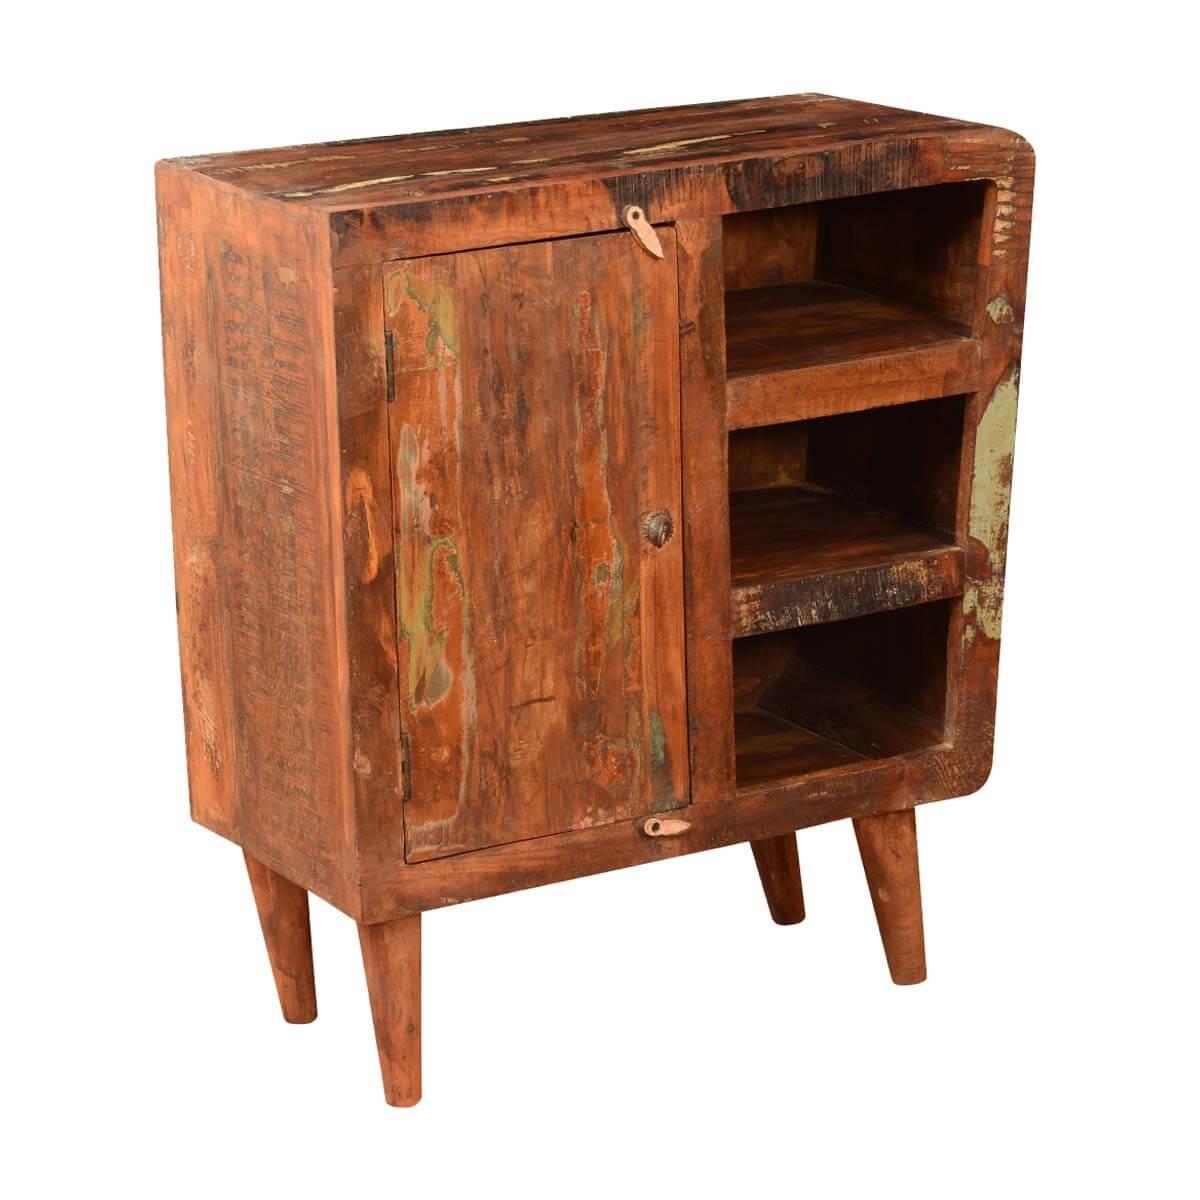 Retro Rustic Reclaimed Wood Cabinet W Open Shelves